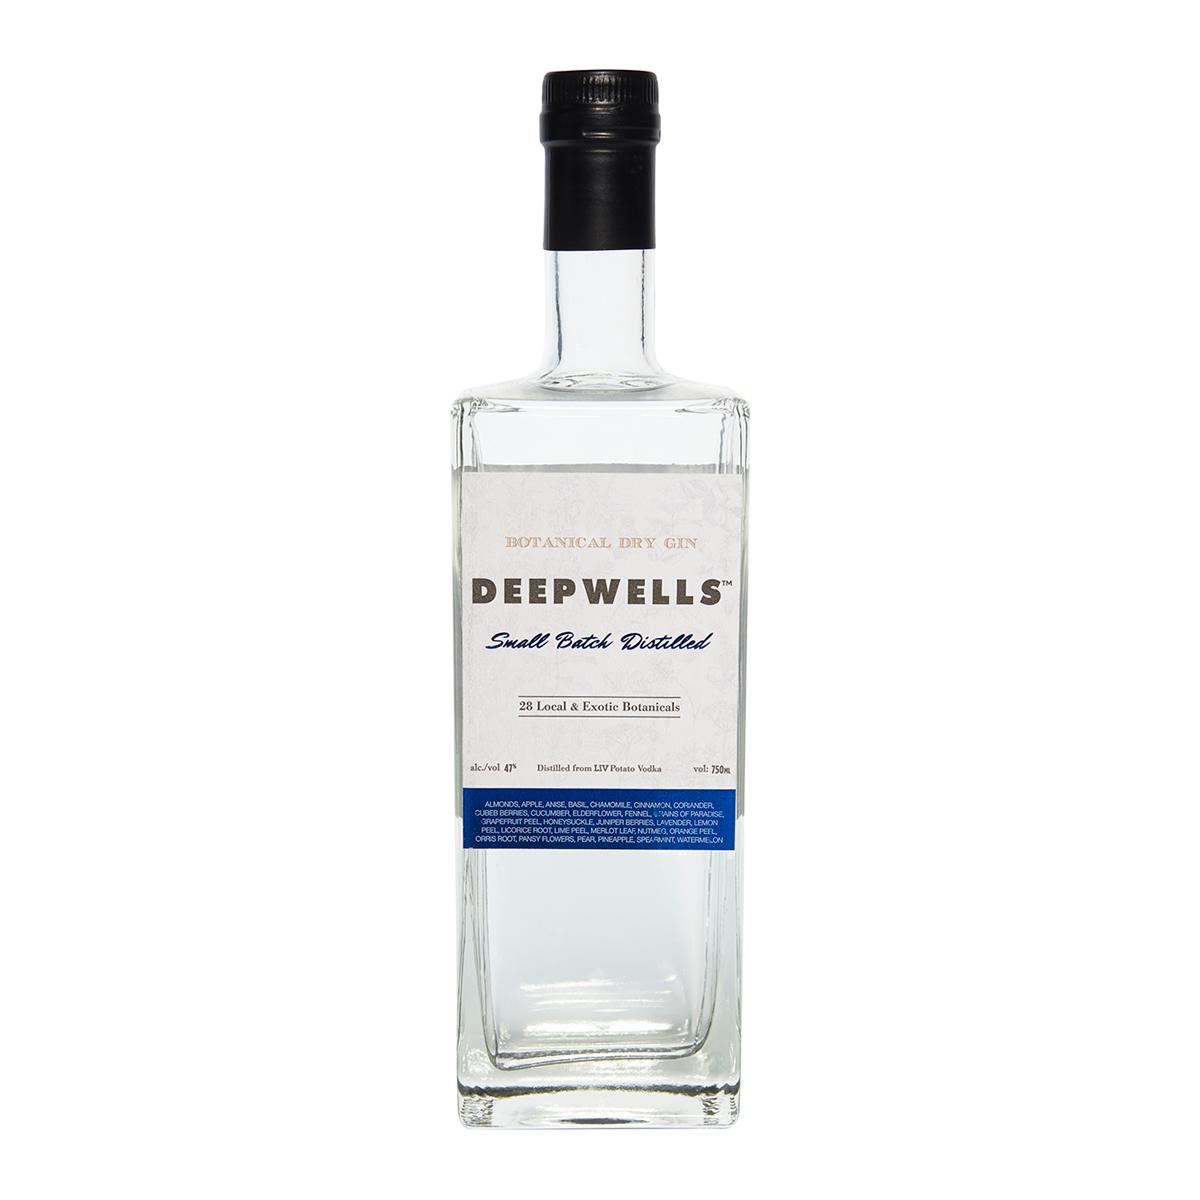 Deepwells-Botanical-Dry-Gin-Large